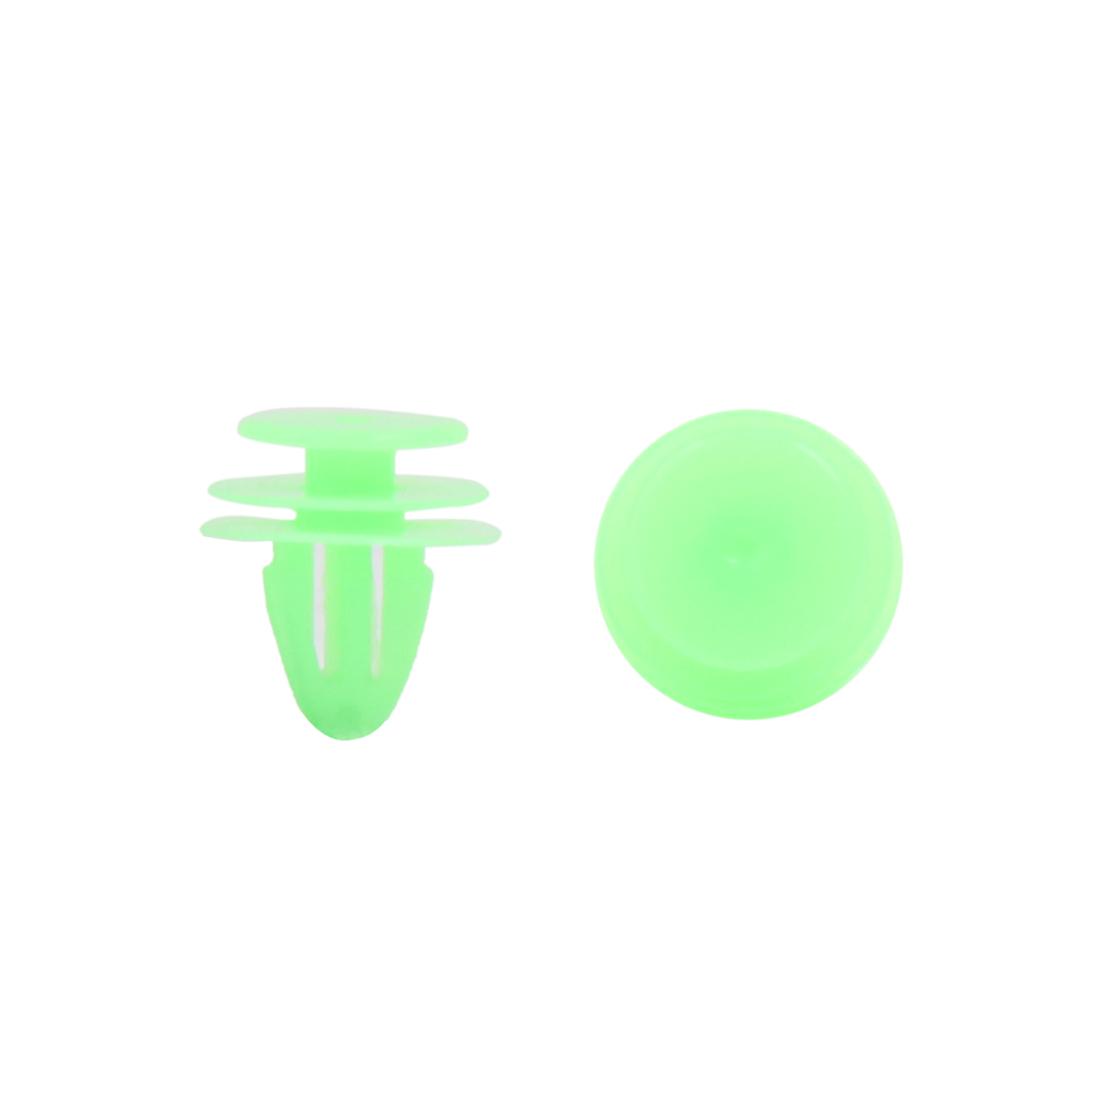 100Pcs 9mm Hole 15.5mm Dia Plastic Rivets Fastener Clips Green for Car Fender